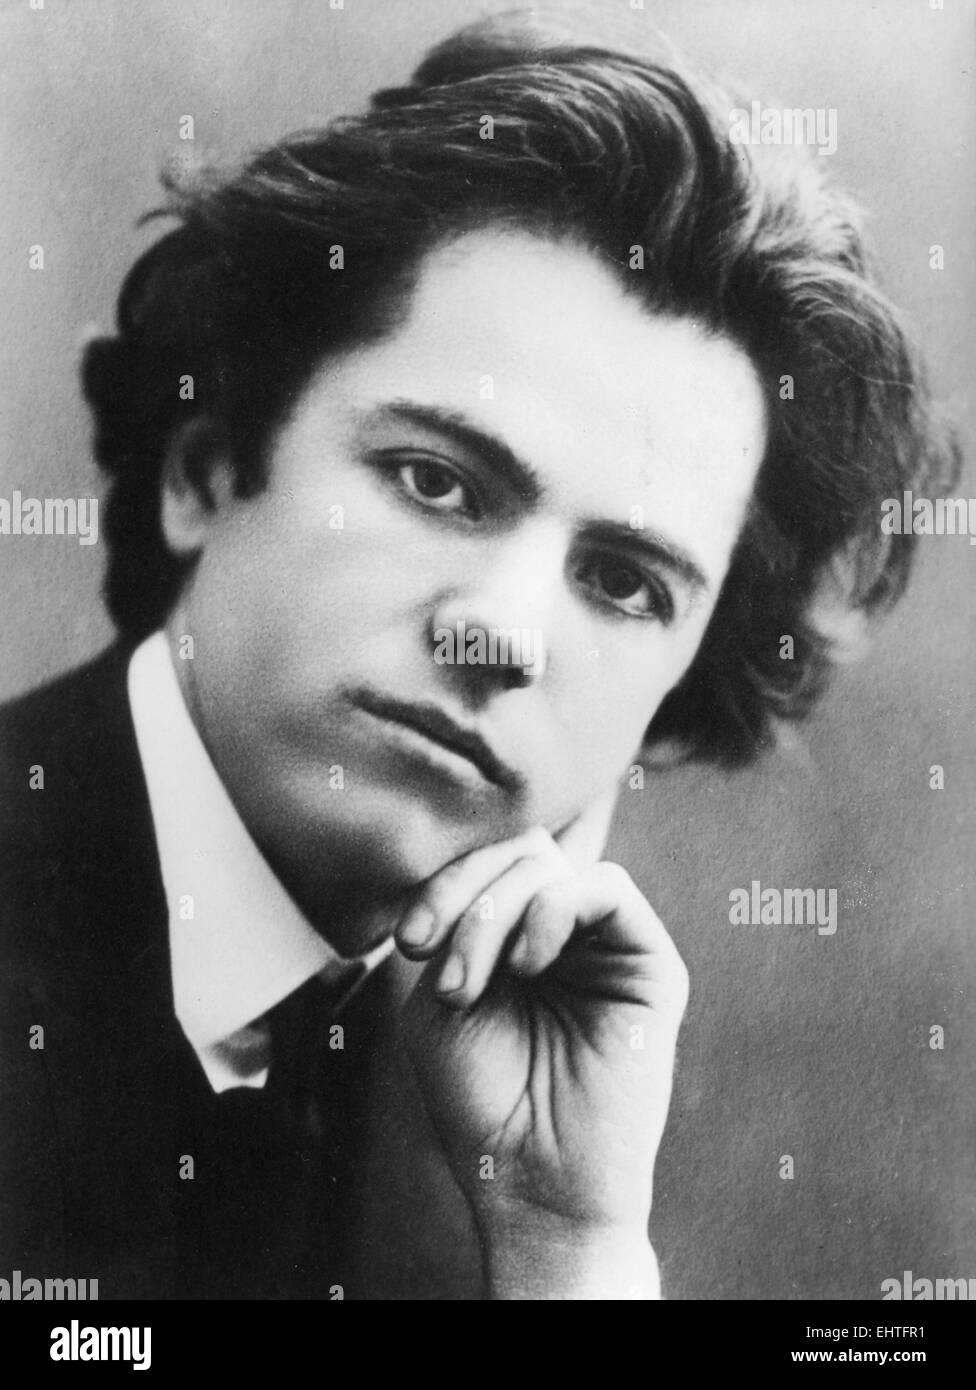 JAN KUBELIK (1880-1940) Czech violinist - Stock Image